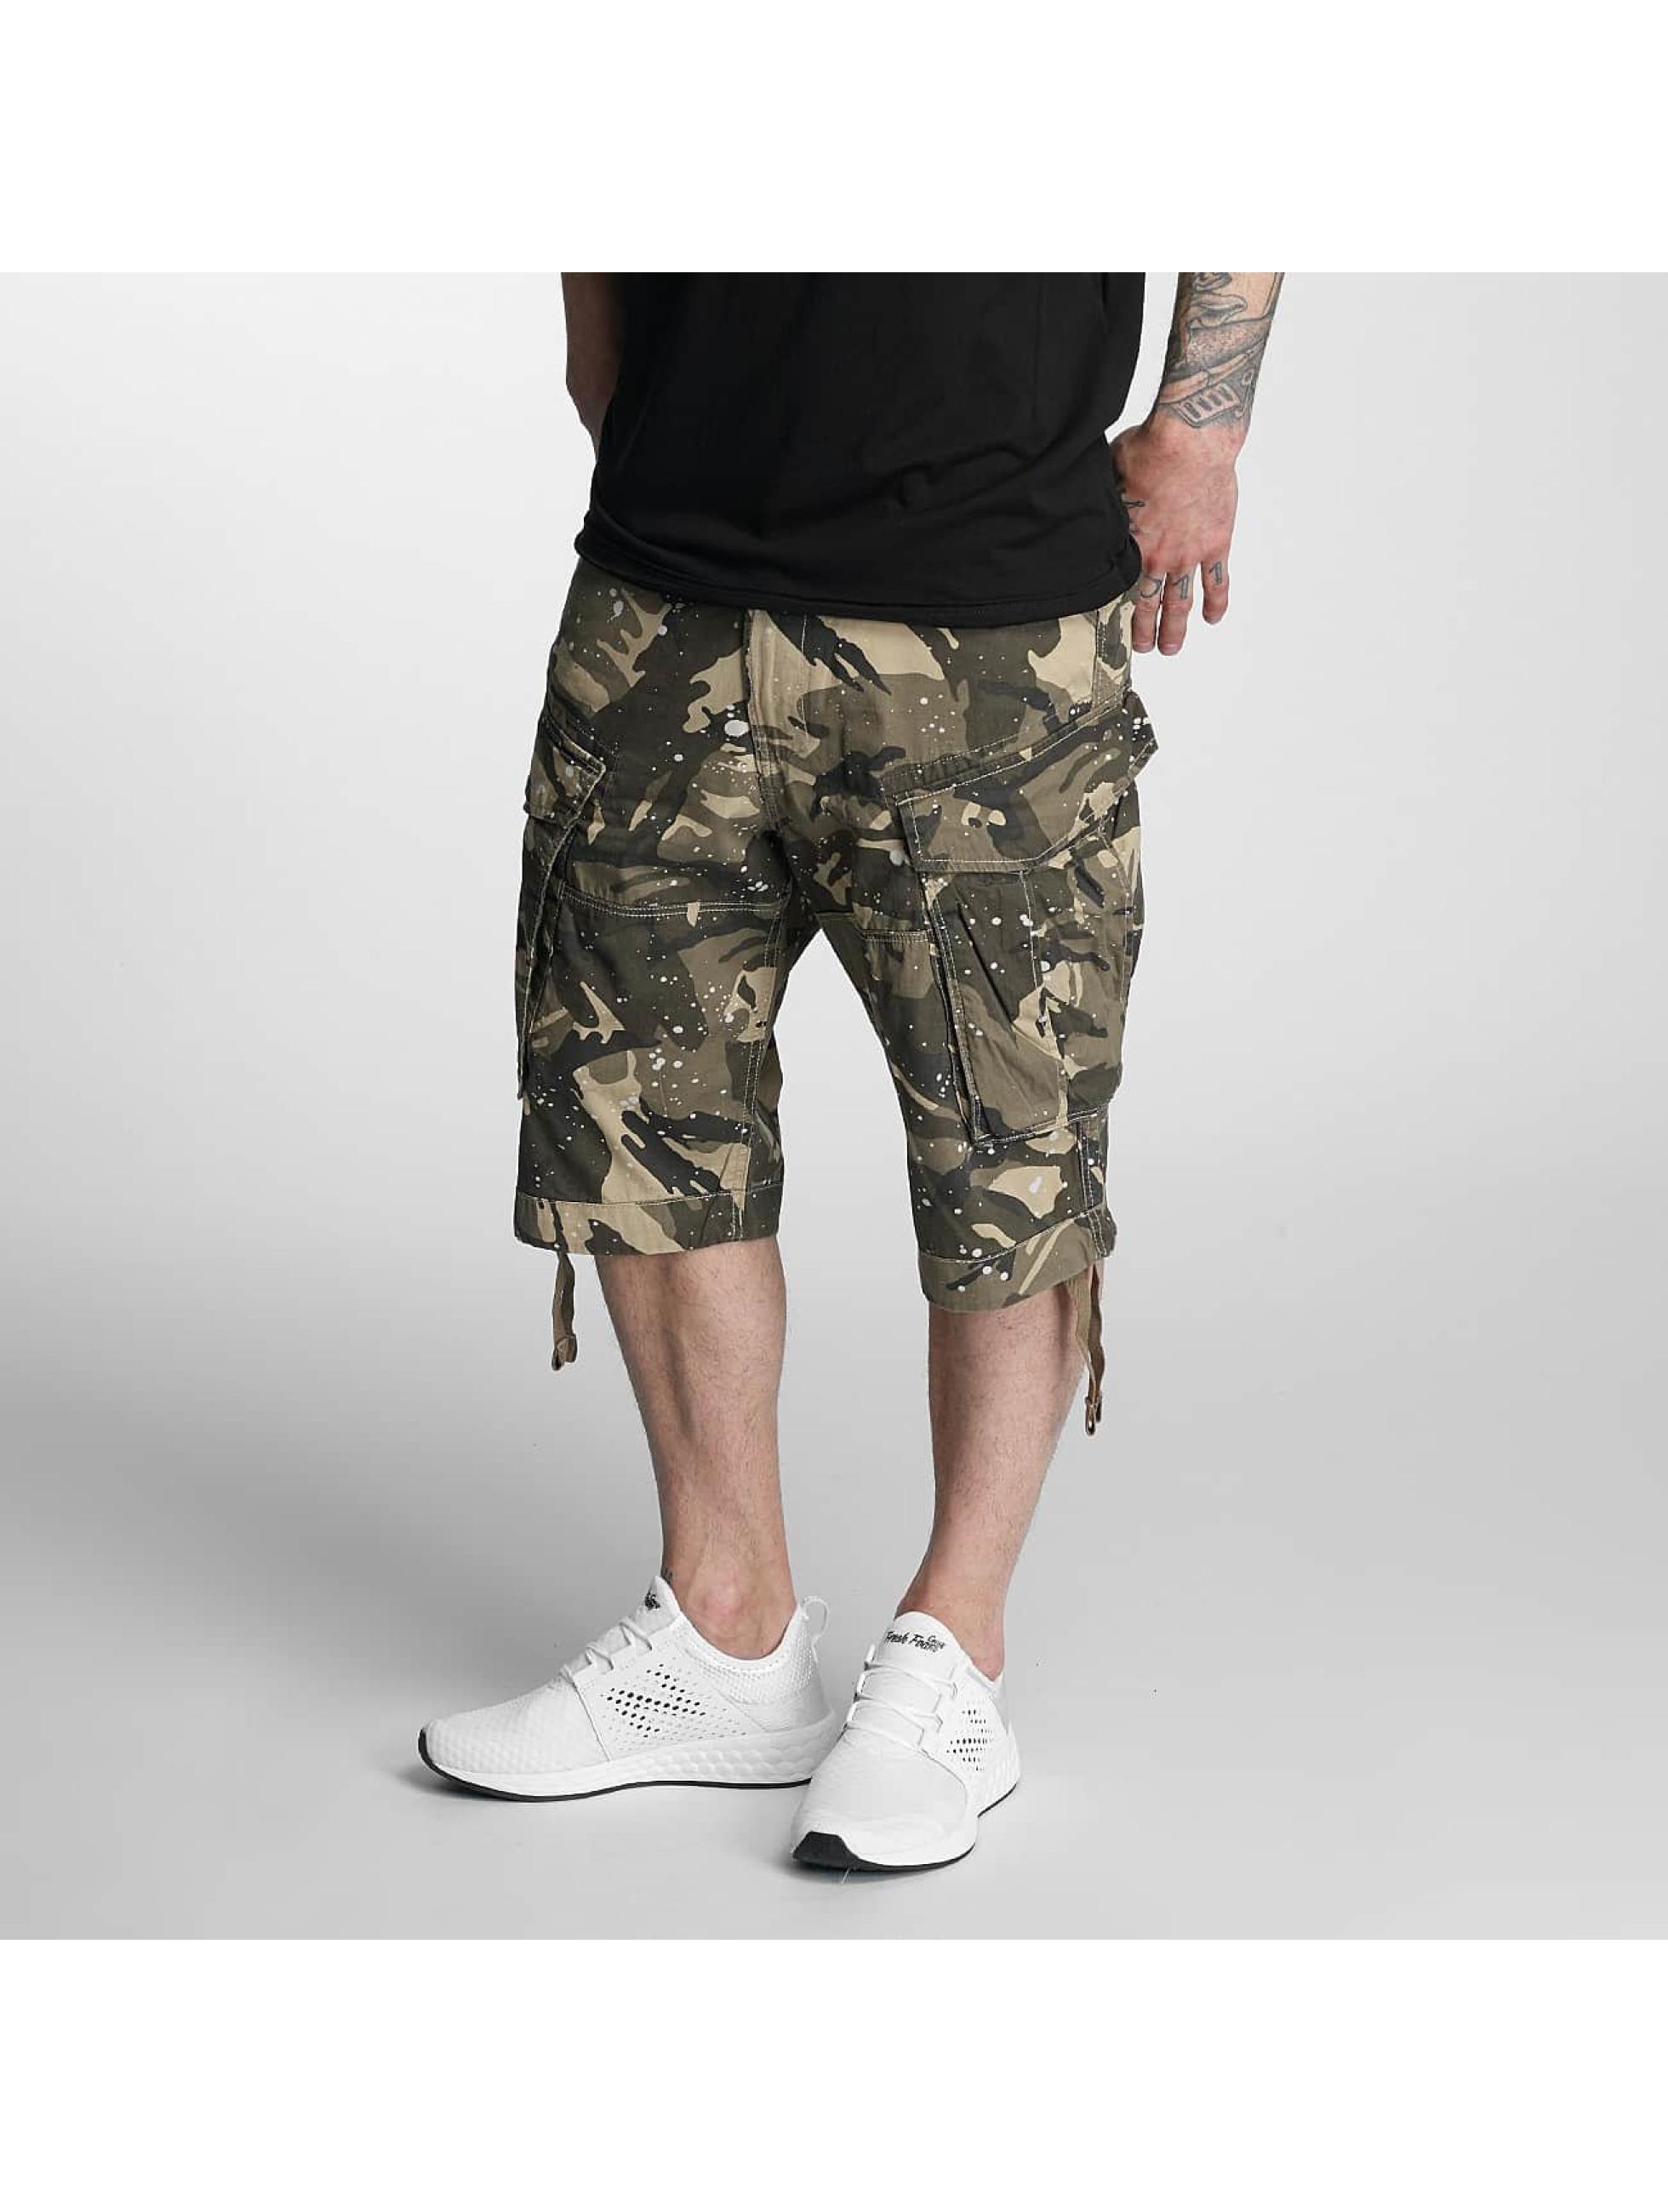 g star herren shorts rovic loose 1 2 in camouflage 310204. Black Bedroom Furniture Sets. Home Design Ideas